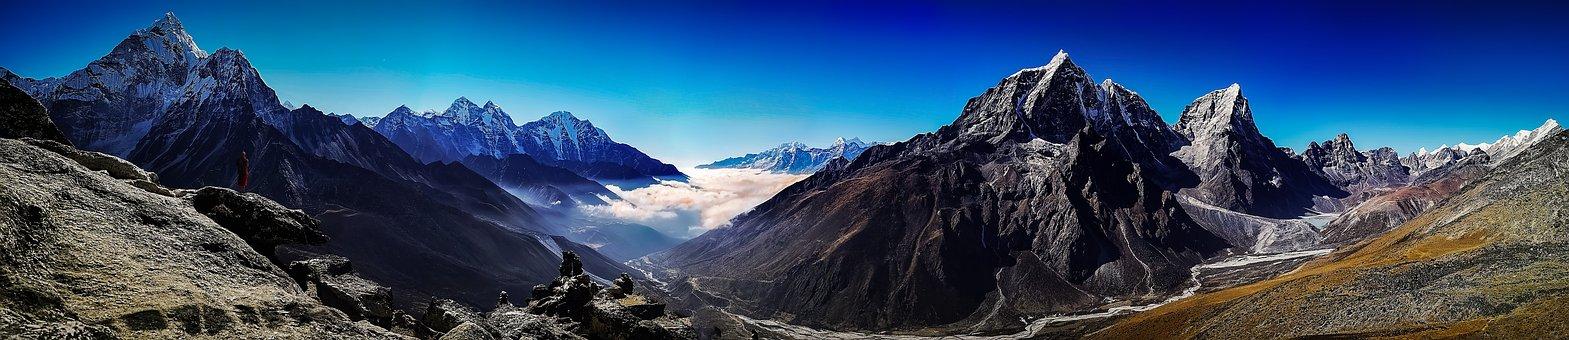 Everest Base Camp, Panoramic, Mountain, Landscape